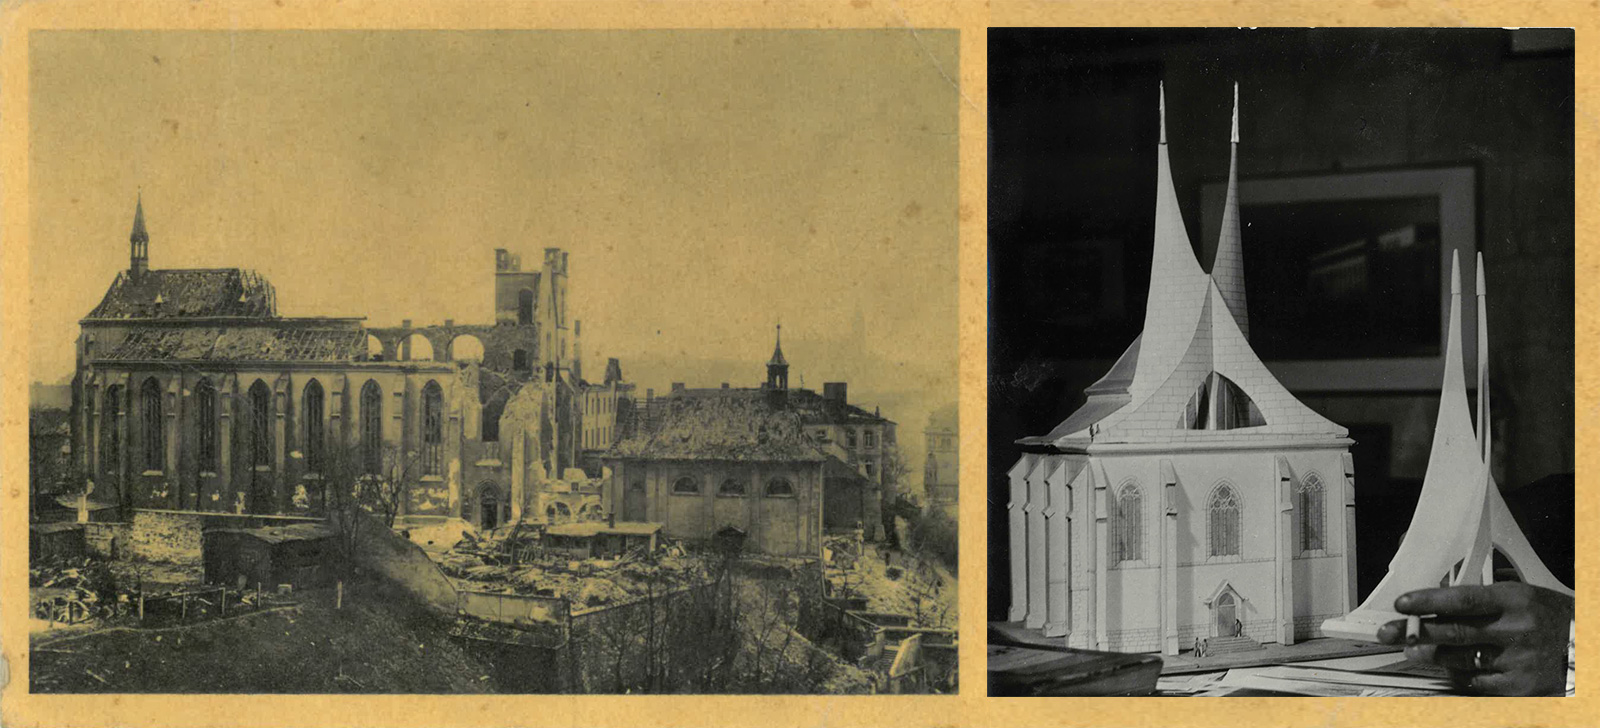 Eamuzy--bombardovani-cerny-arthouse-projekt-hejtmanek